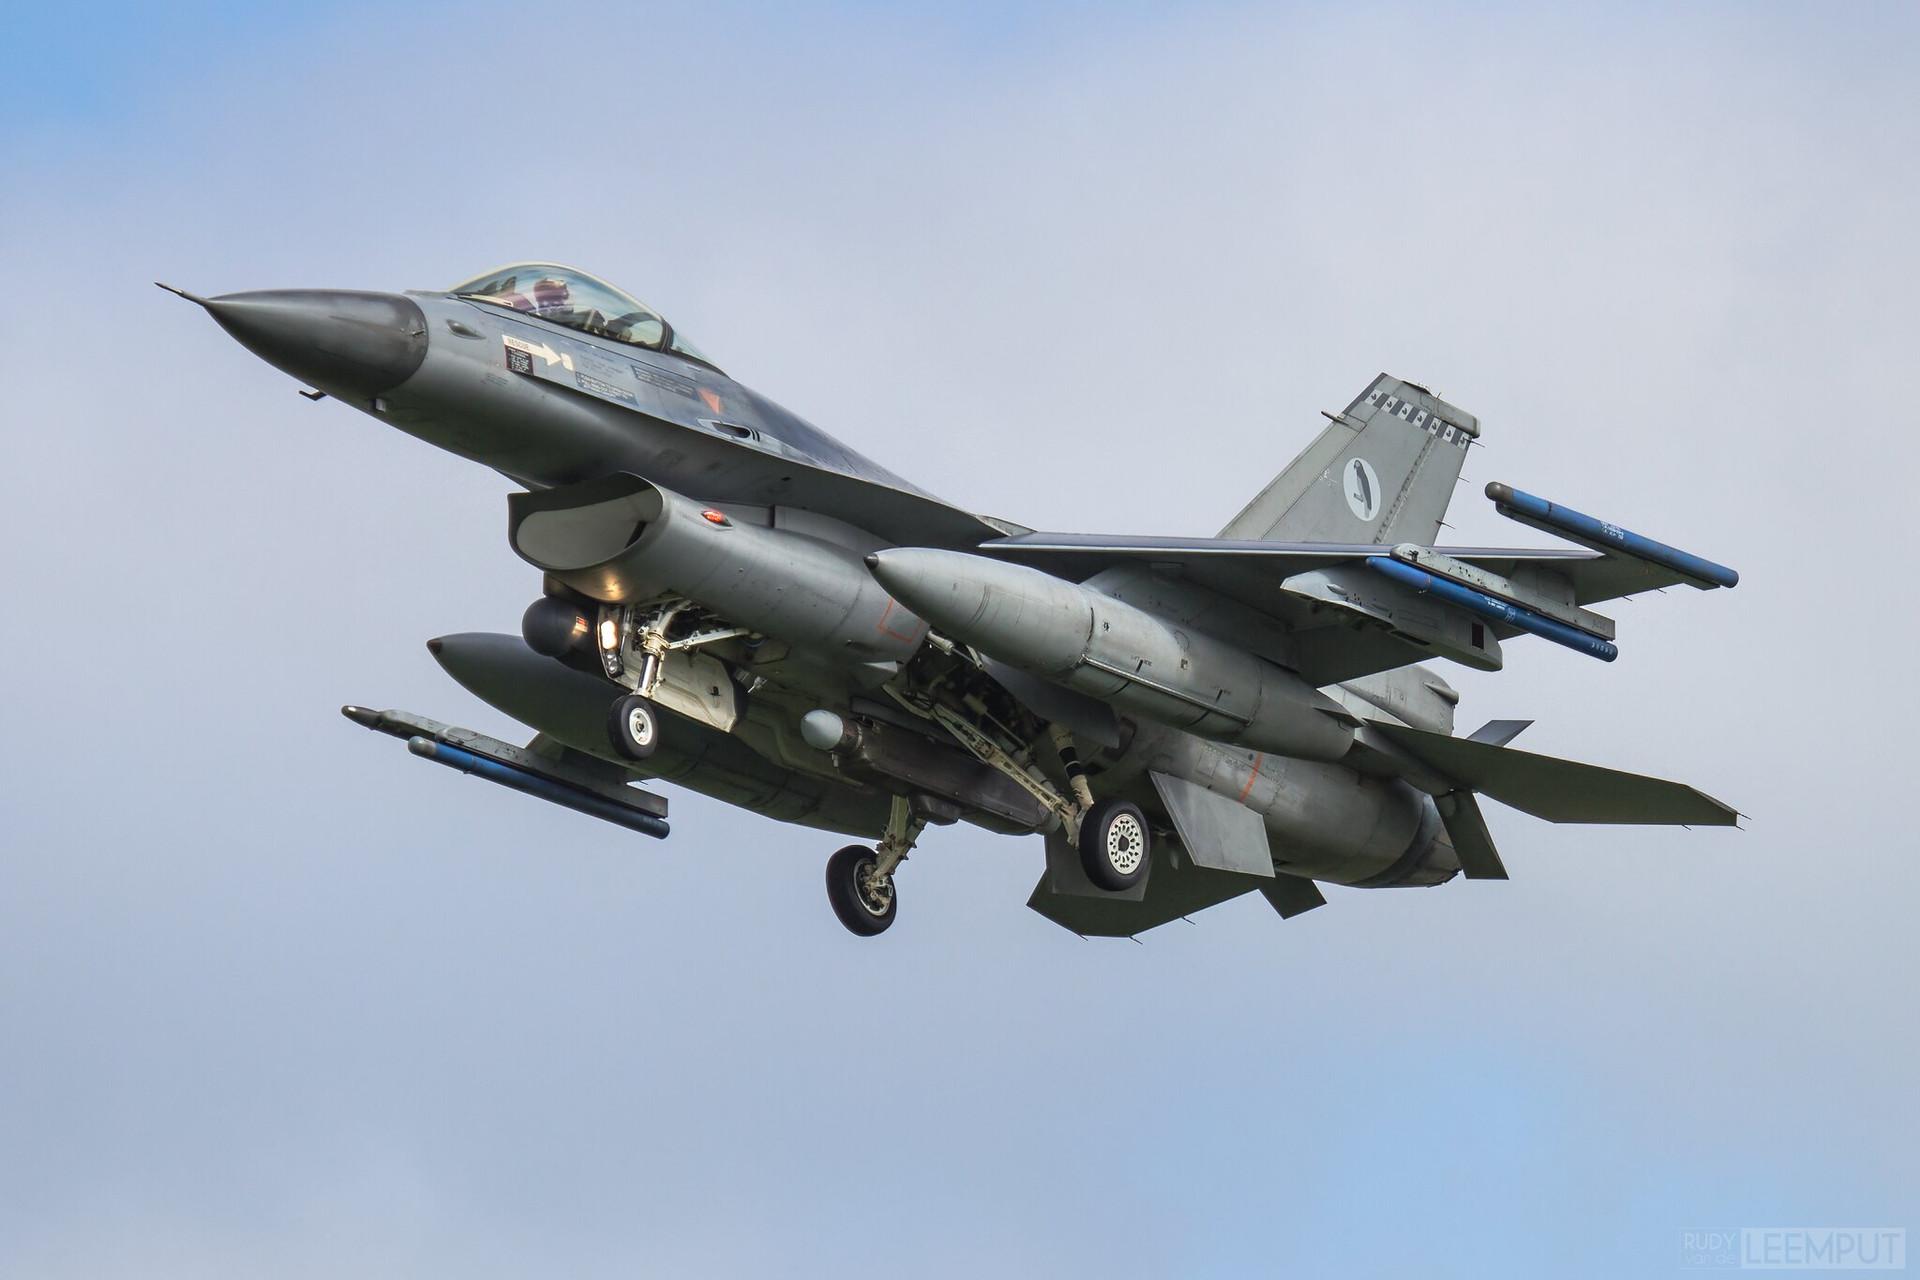 J-009   Build: 1991 - Lockheed F-16 A Fighting Falcon